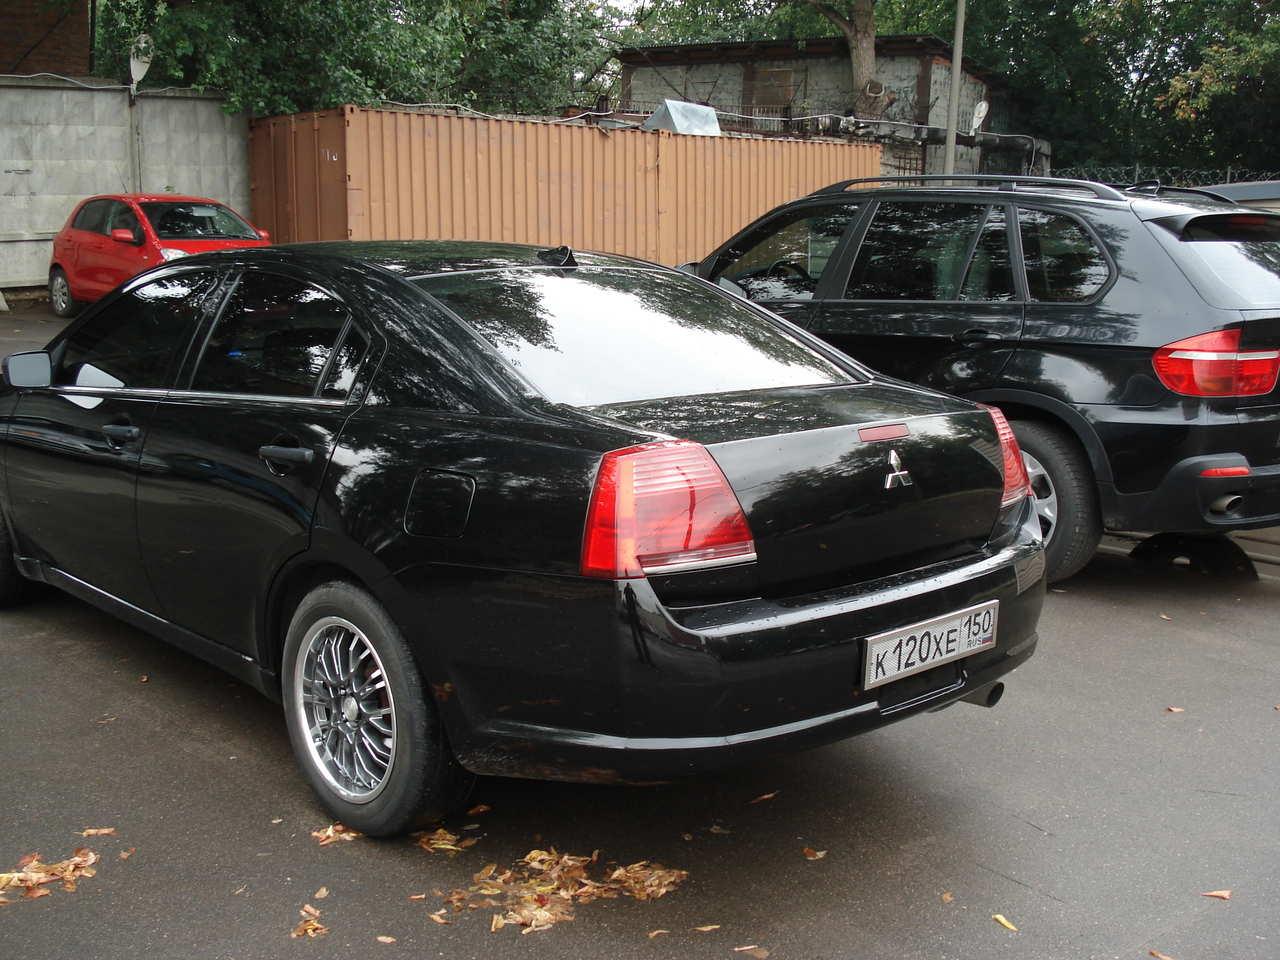 2004 Mitsubishi Galant Pictures, 2.4l., Gasoline, FF, Automatic For Sale